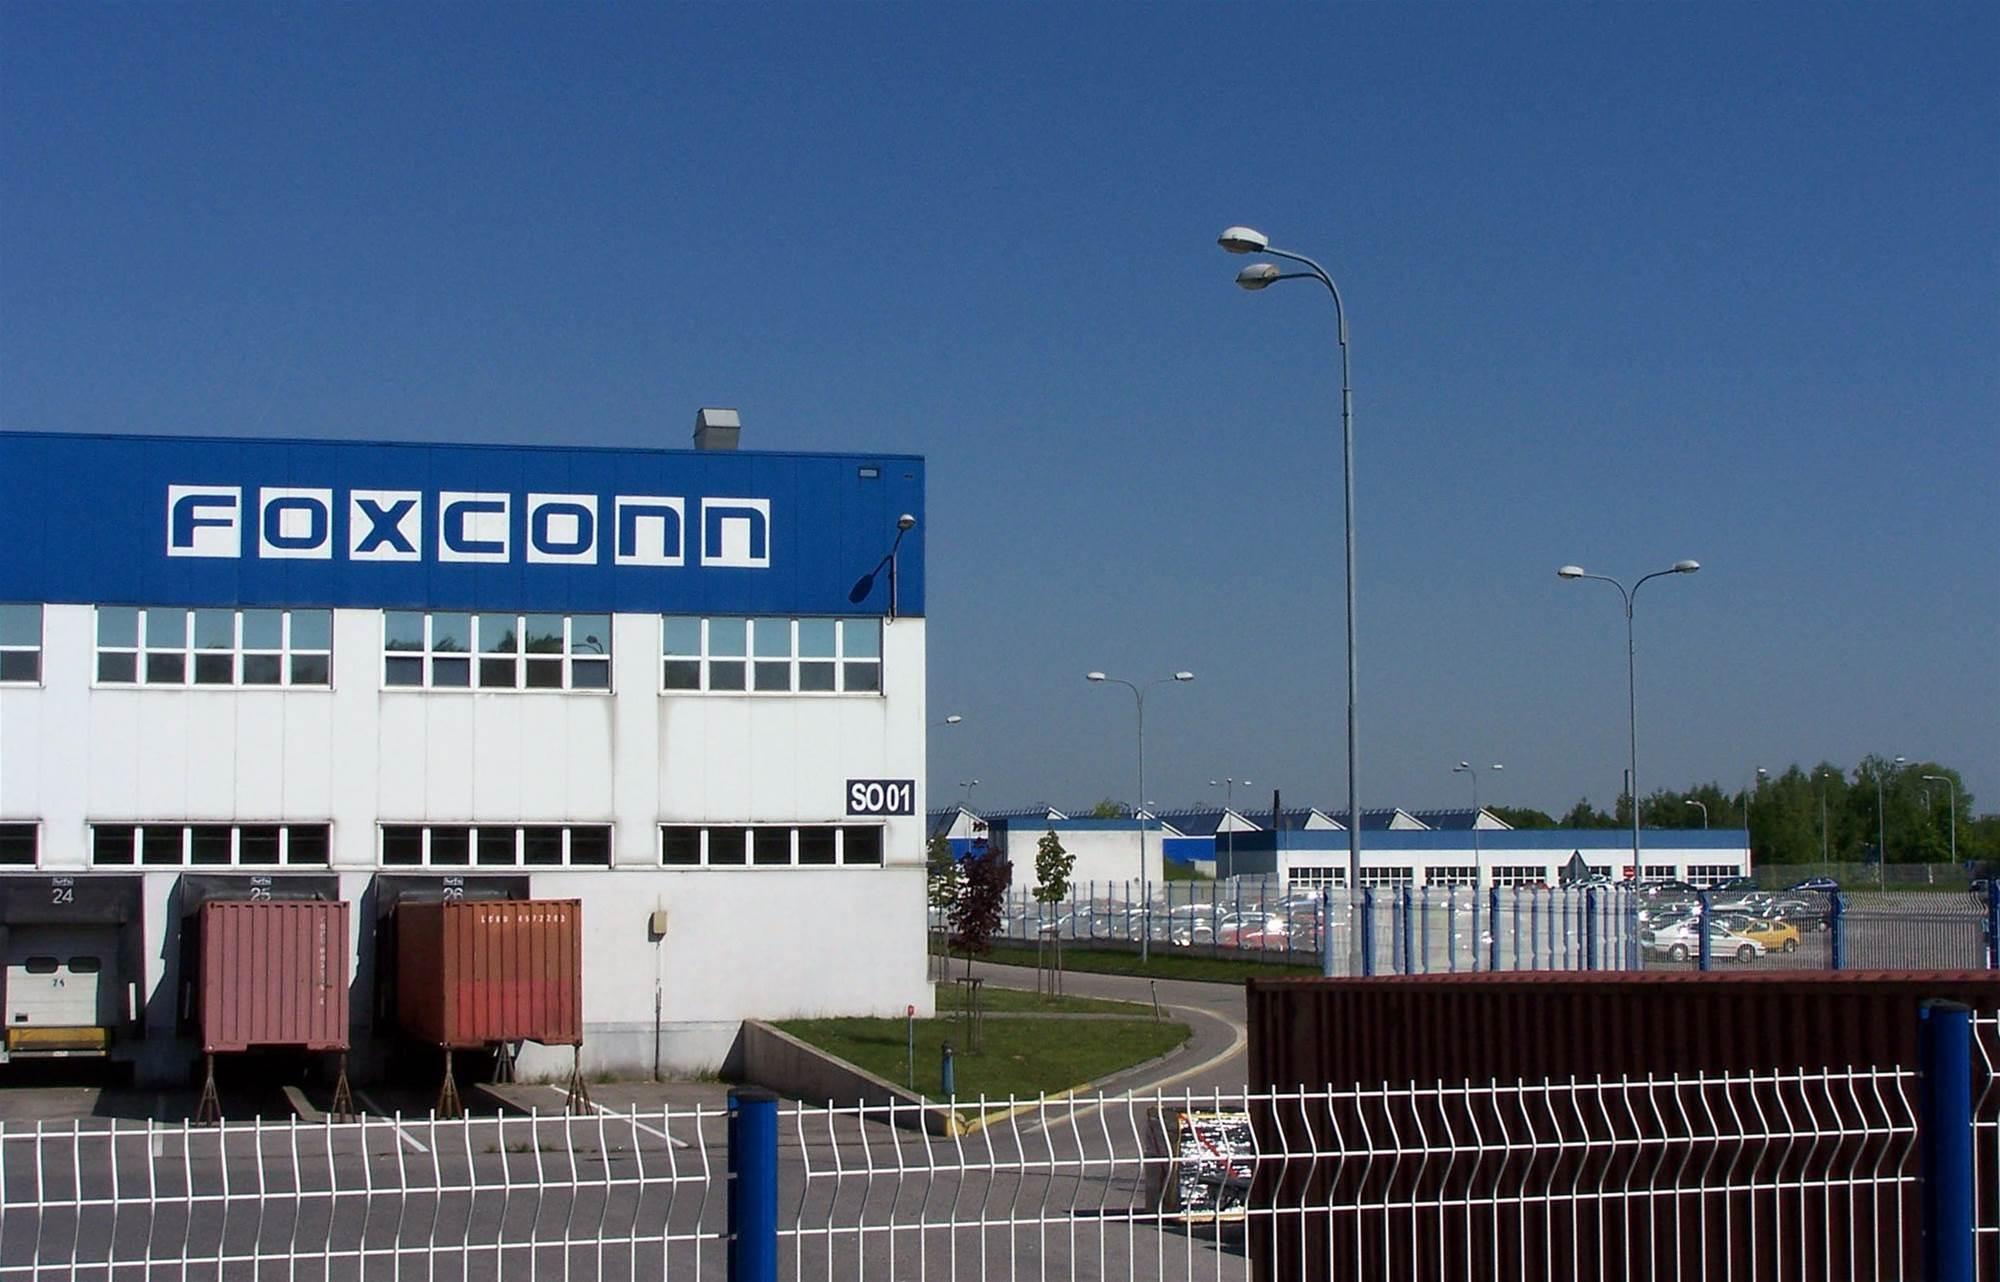 Foxconn buys Belkin for $1bn